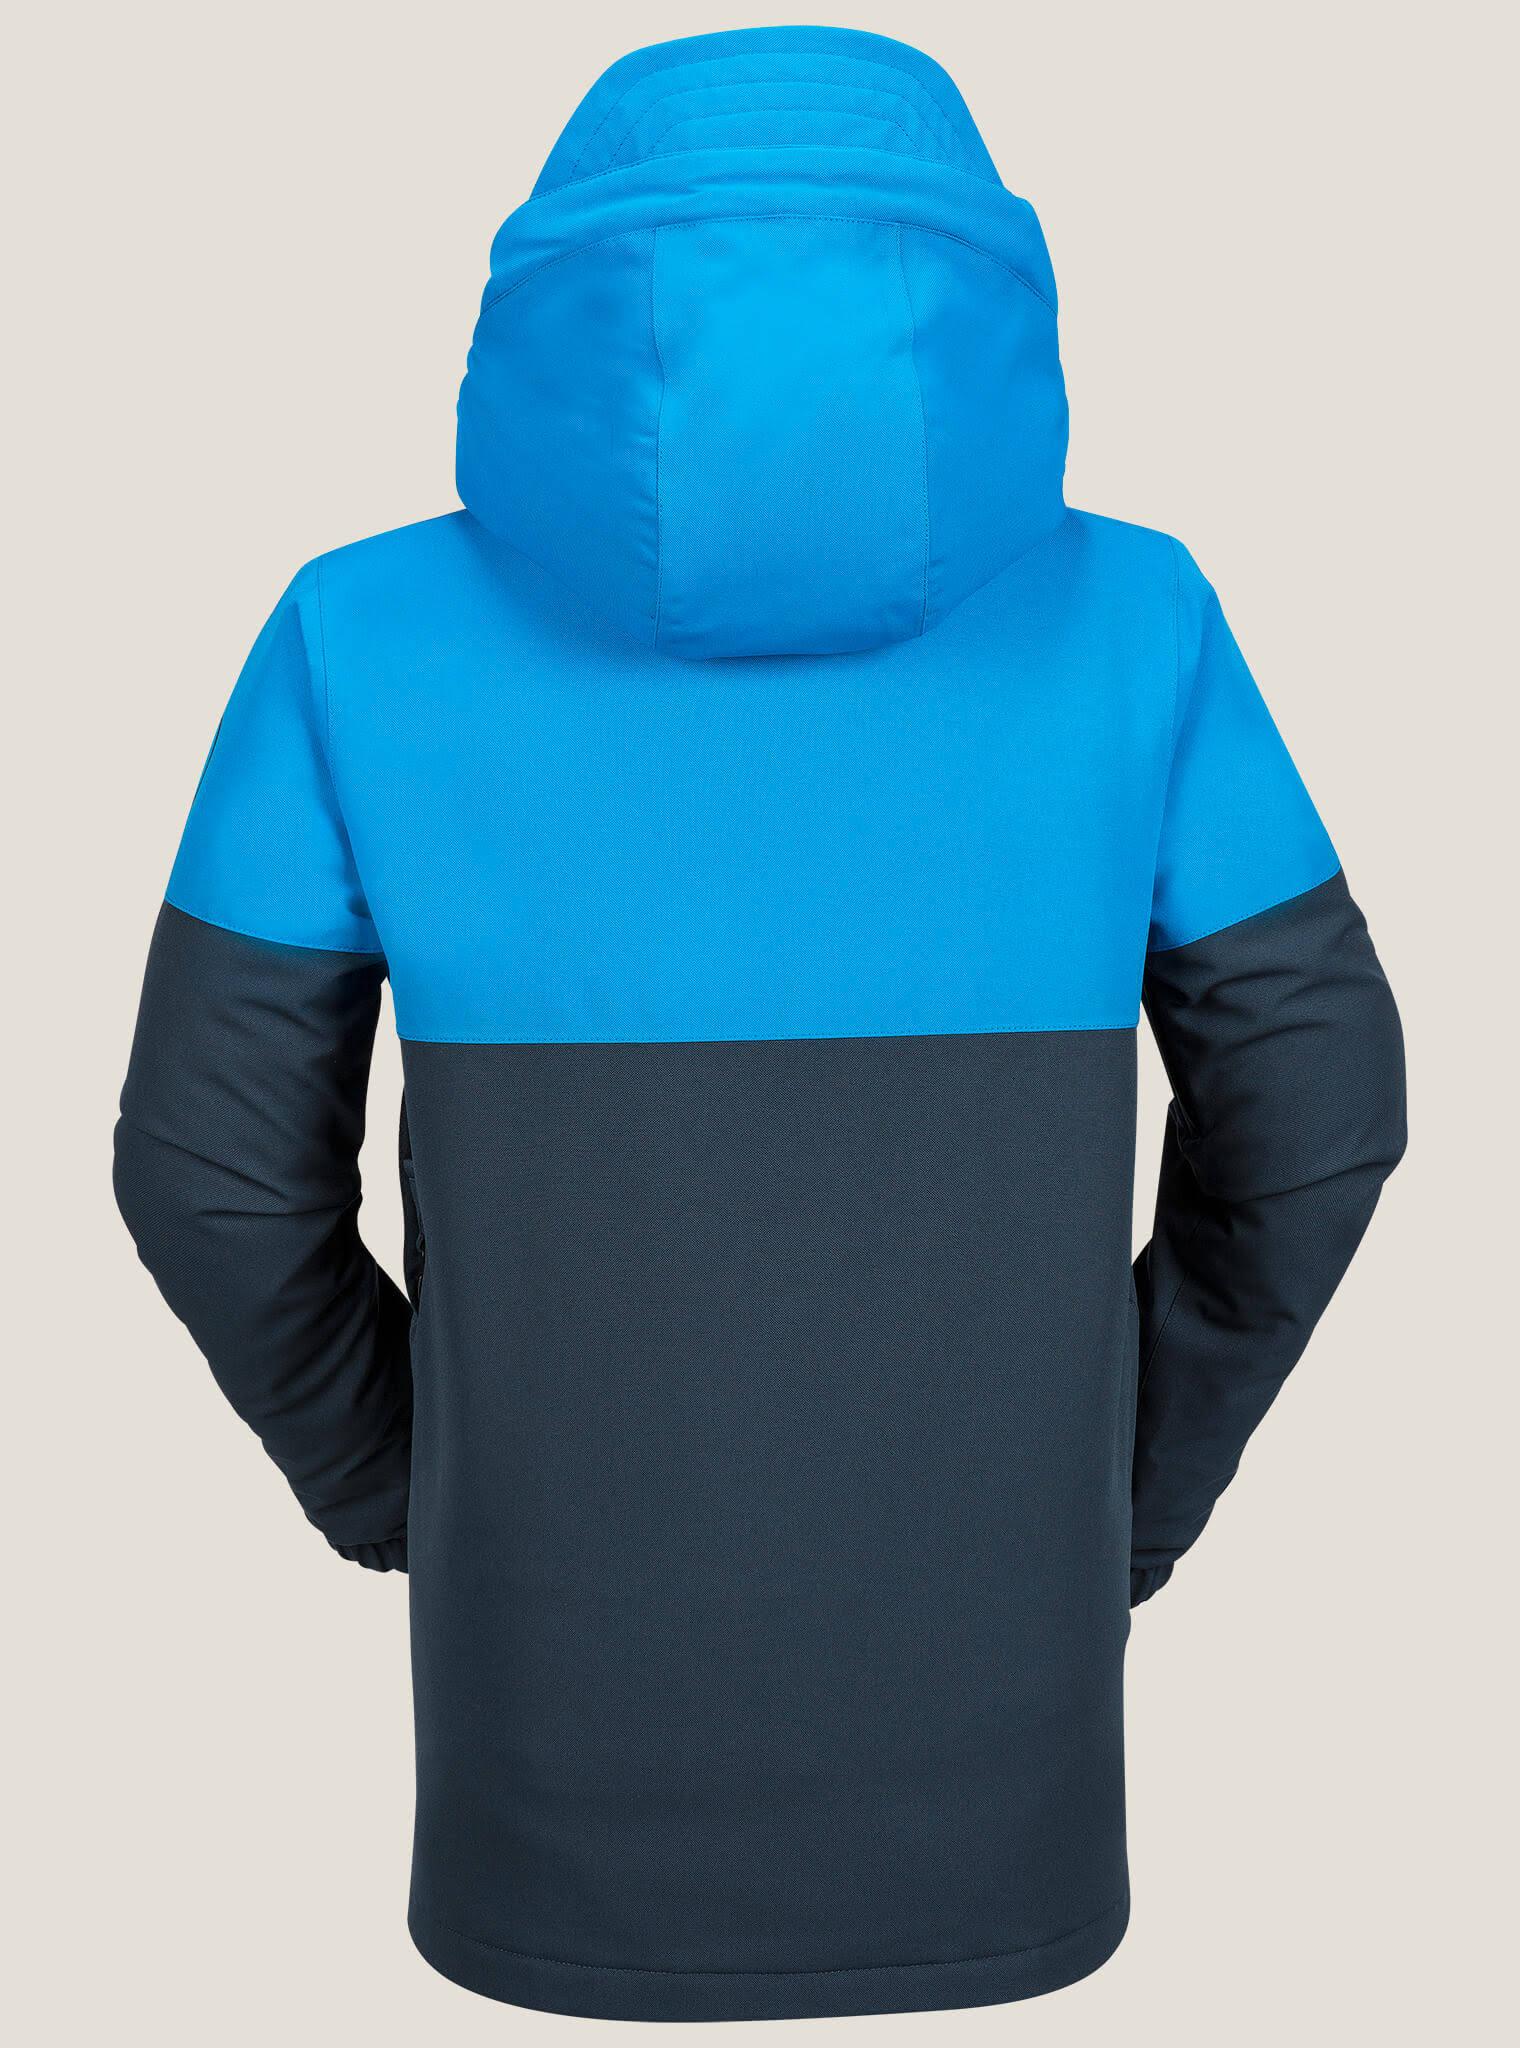 Niños Chaqueta Con Bloqueada Volcom Azul Para M Marino Aislante Vintage Capucha rr1q5twz